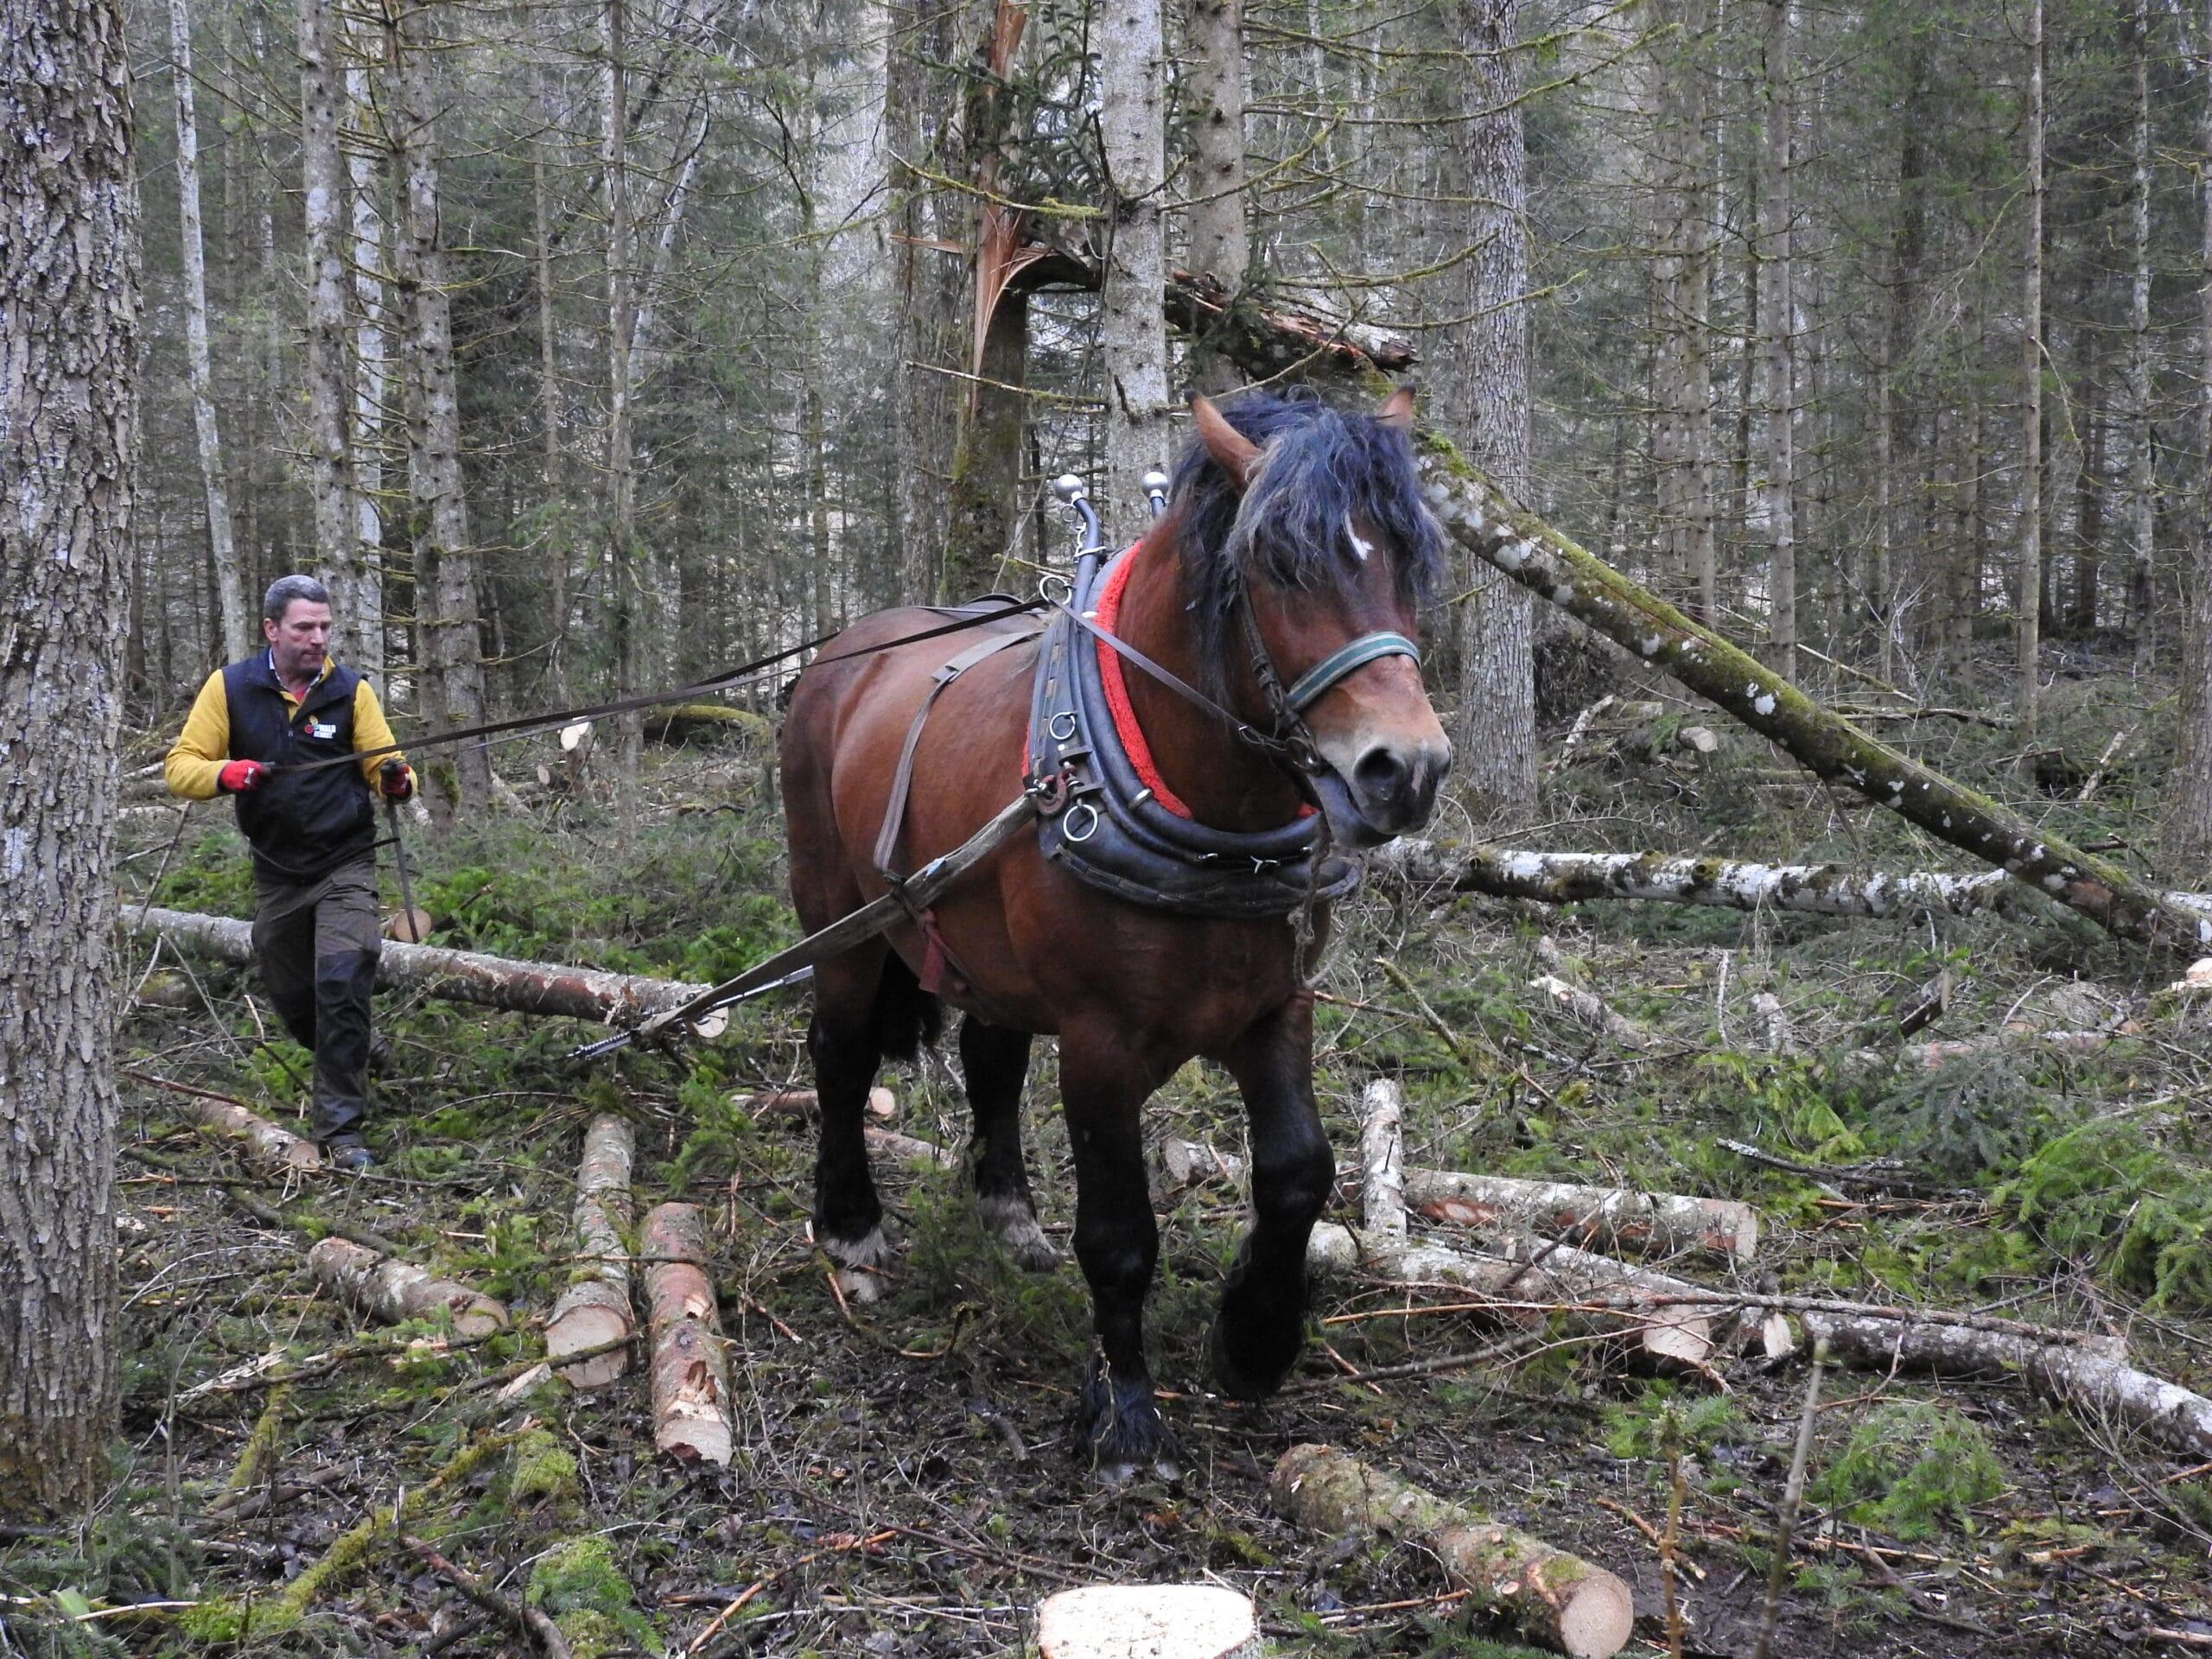 2021_03_16_Pferderueckung_im_Nationalpark_Gesaeuse_c_Christian_Mayer_1